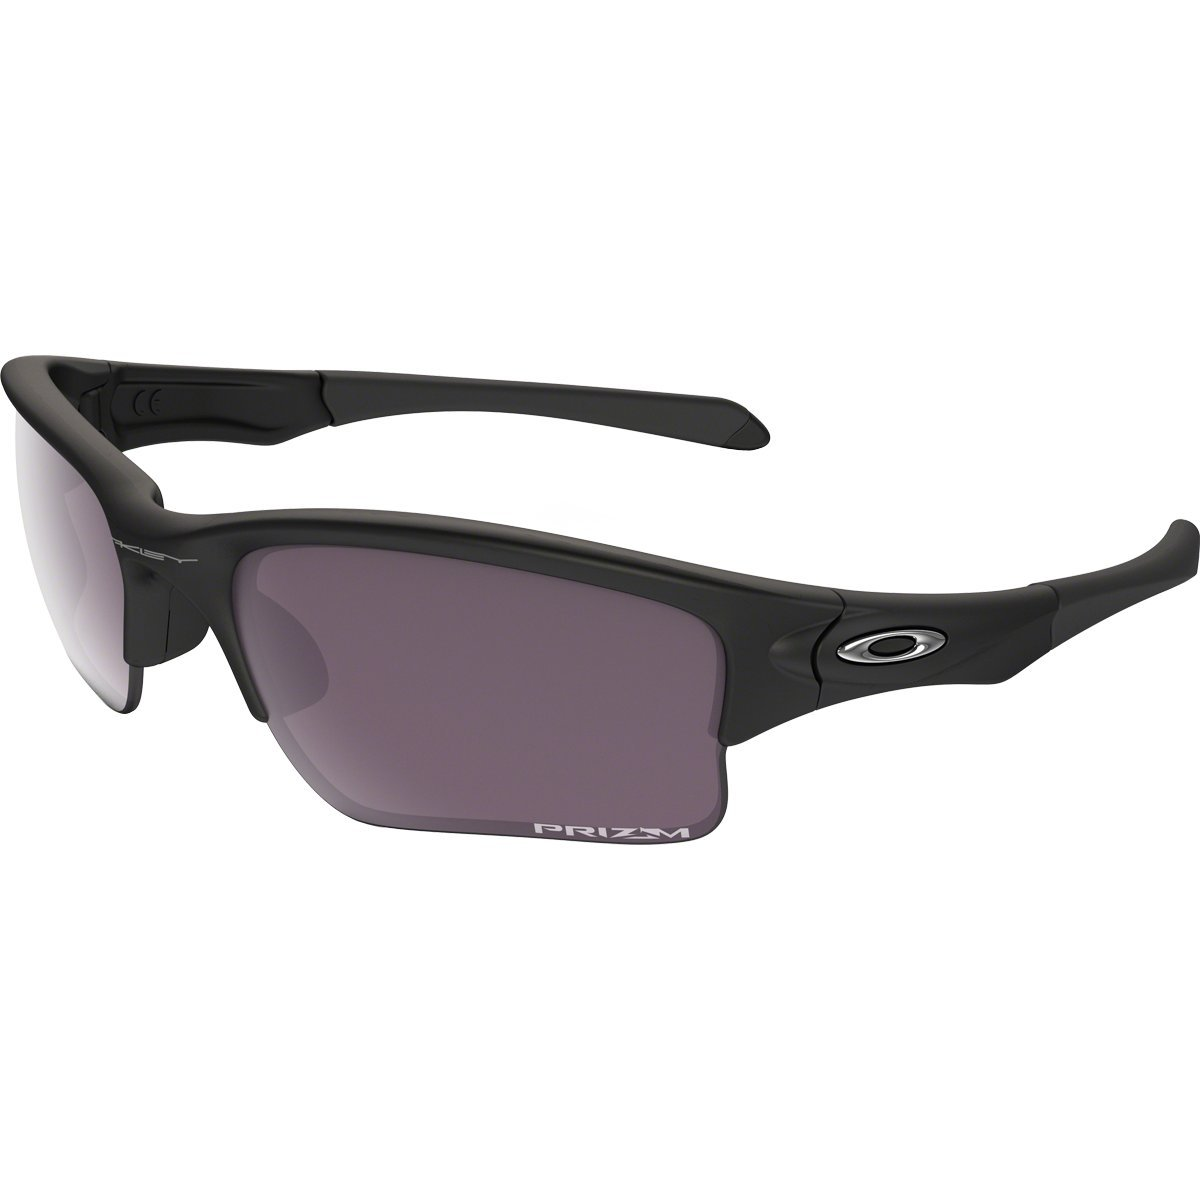 Oakley Men's Quarter Jacket Polarized Iridium Rectangular Sunglasses, Matte Black, 61 mm